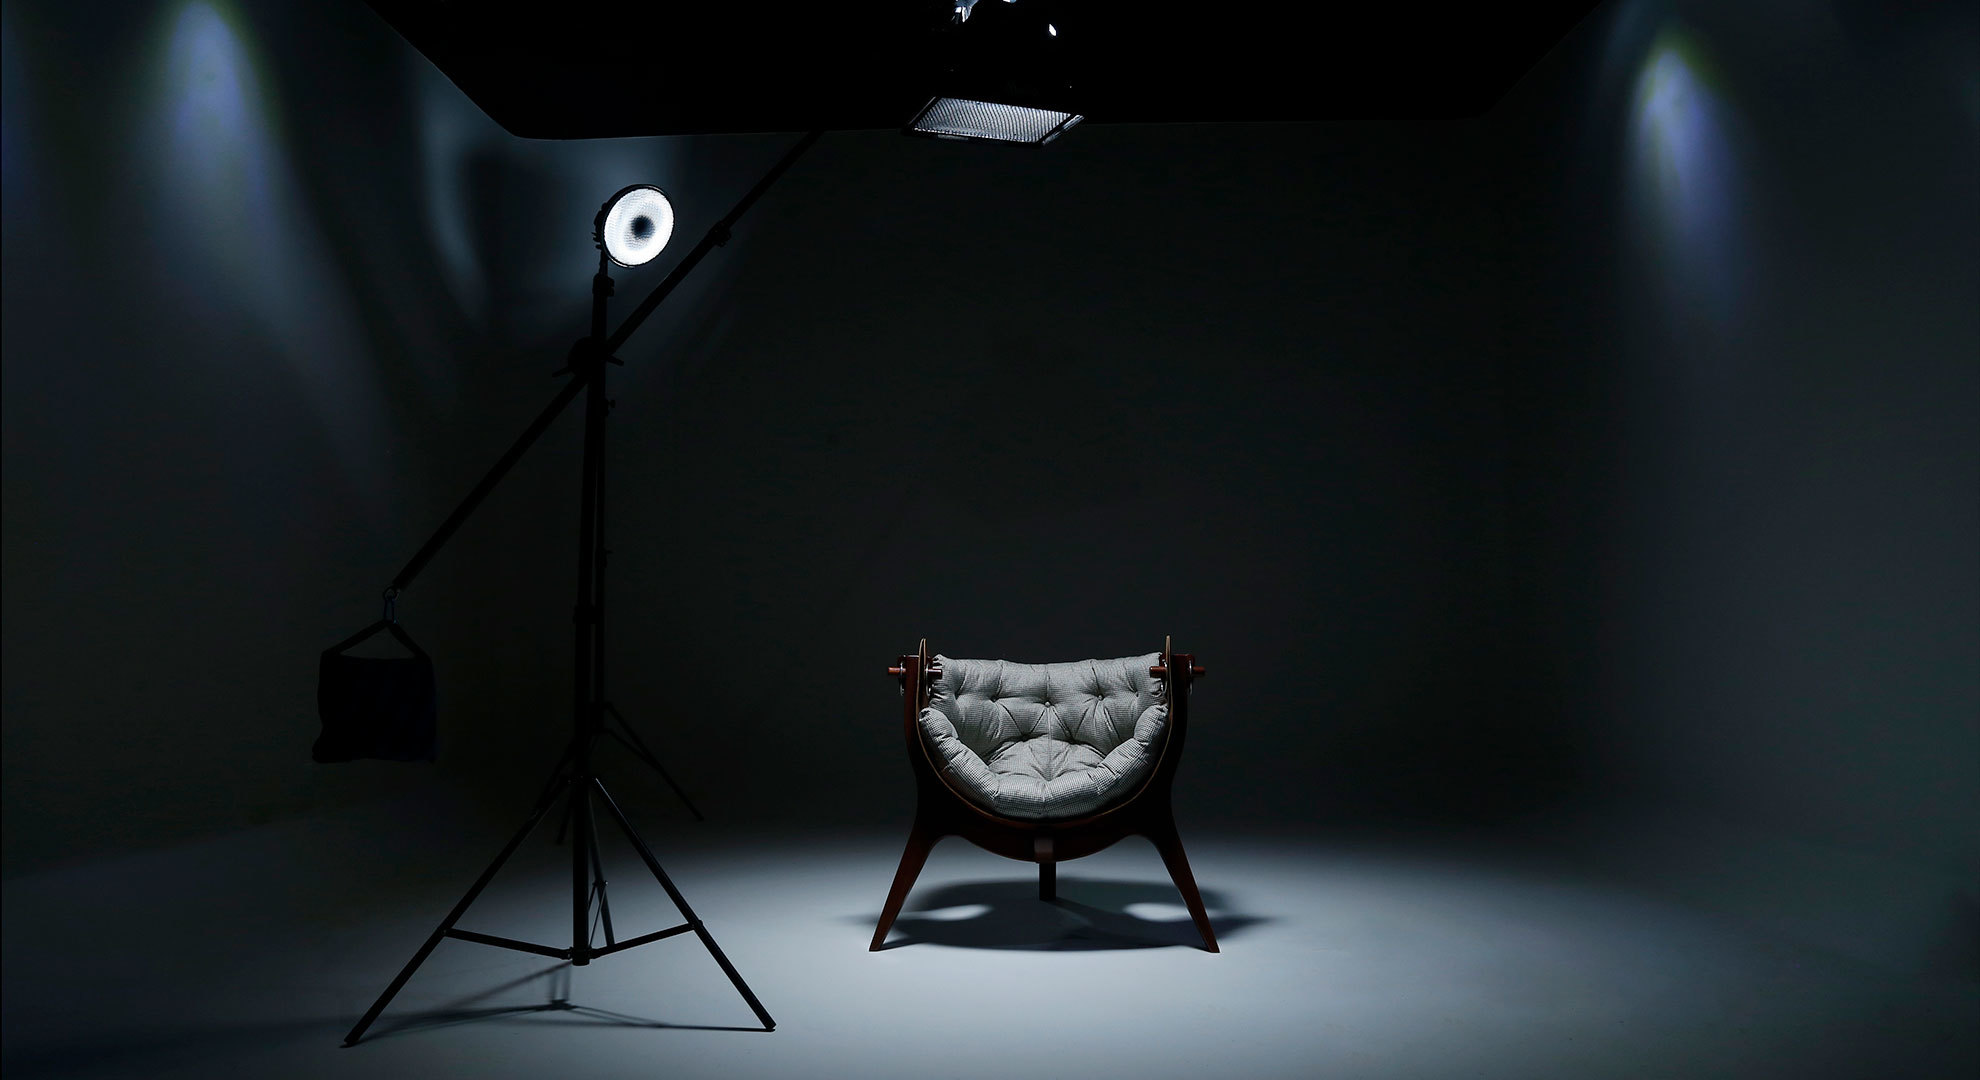 Contate Qi Studio Fotografico